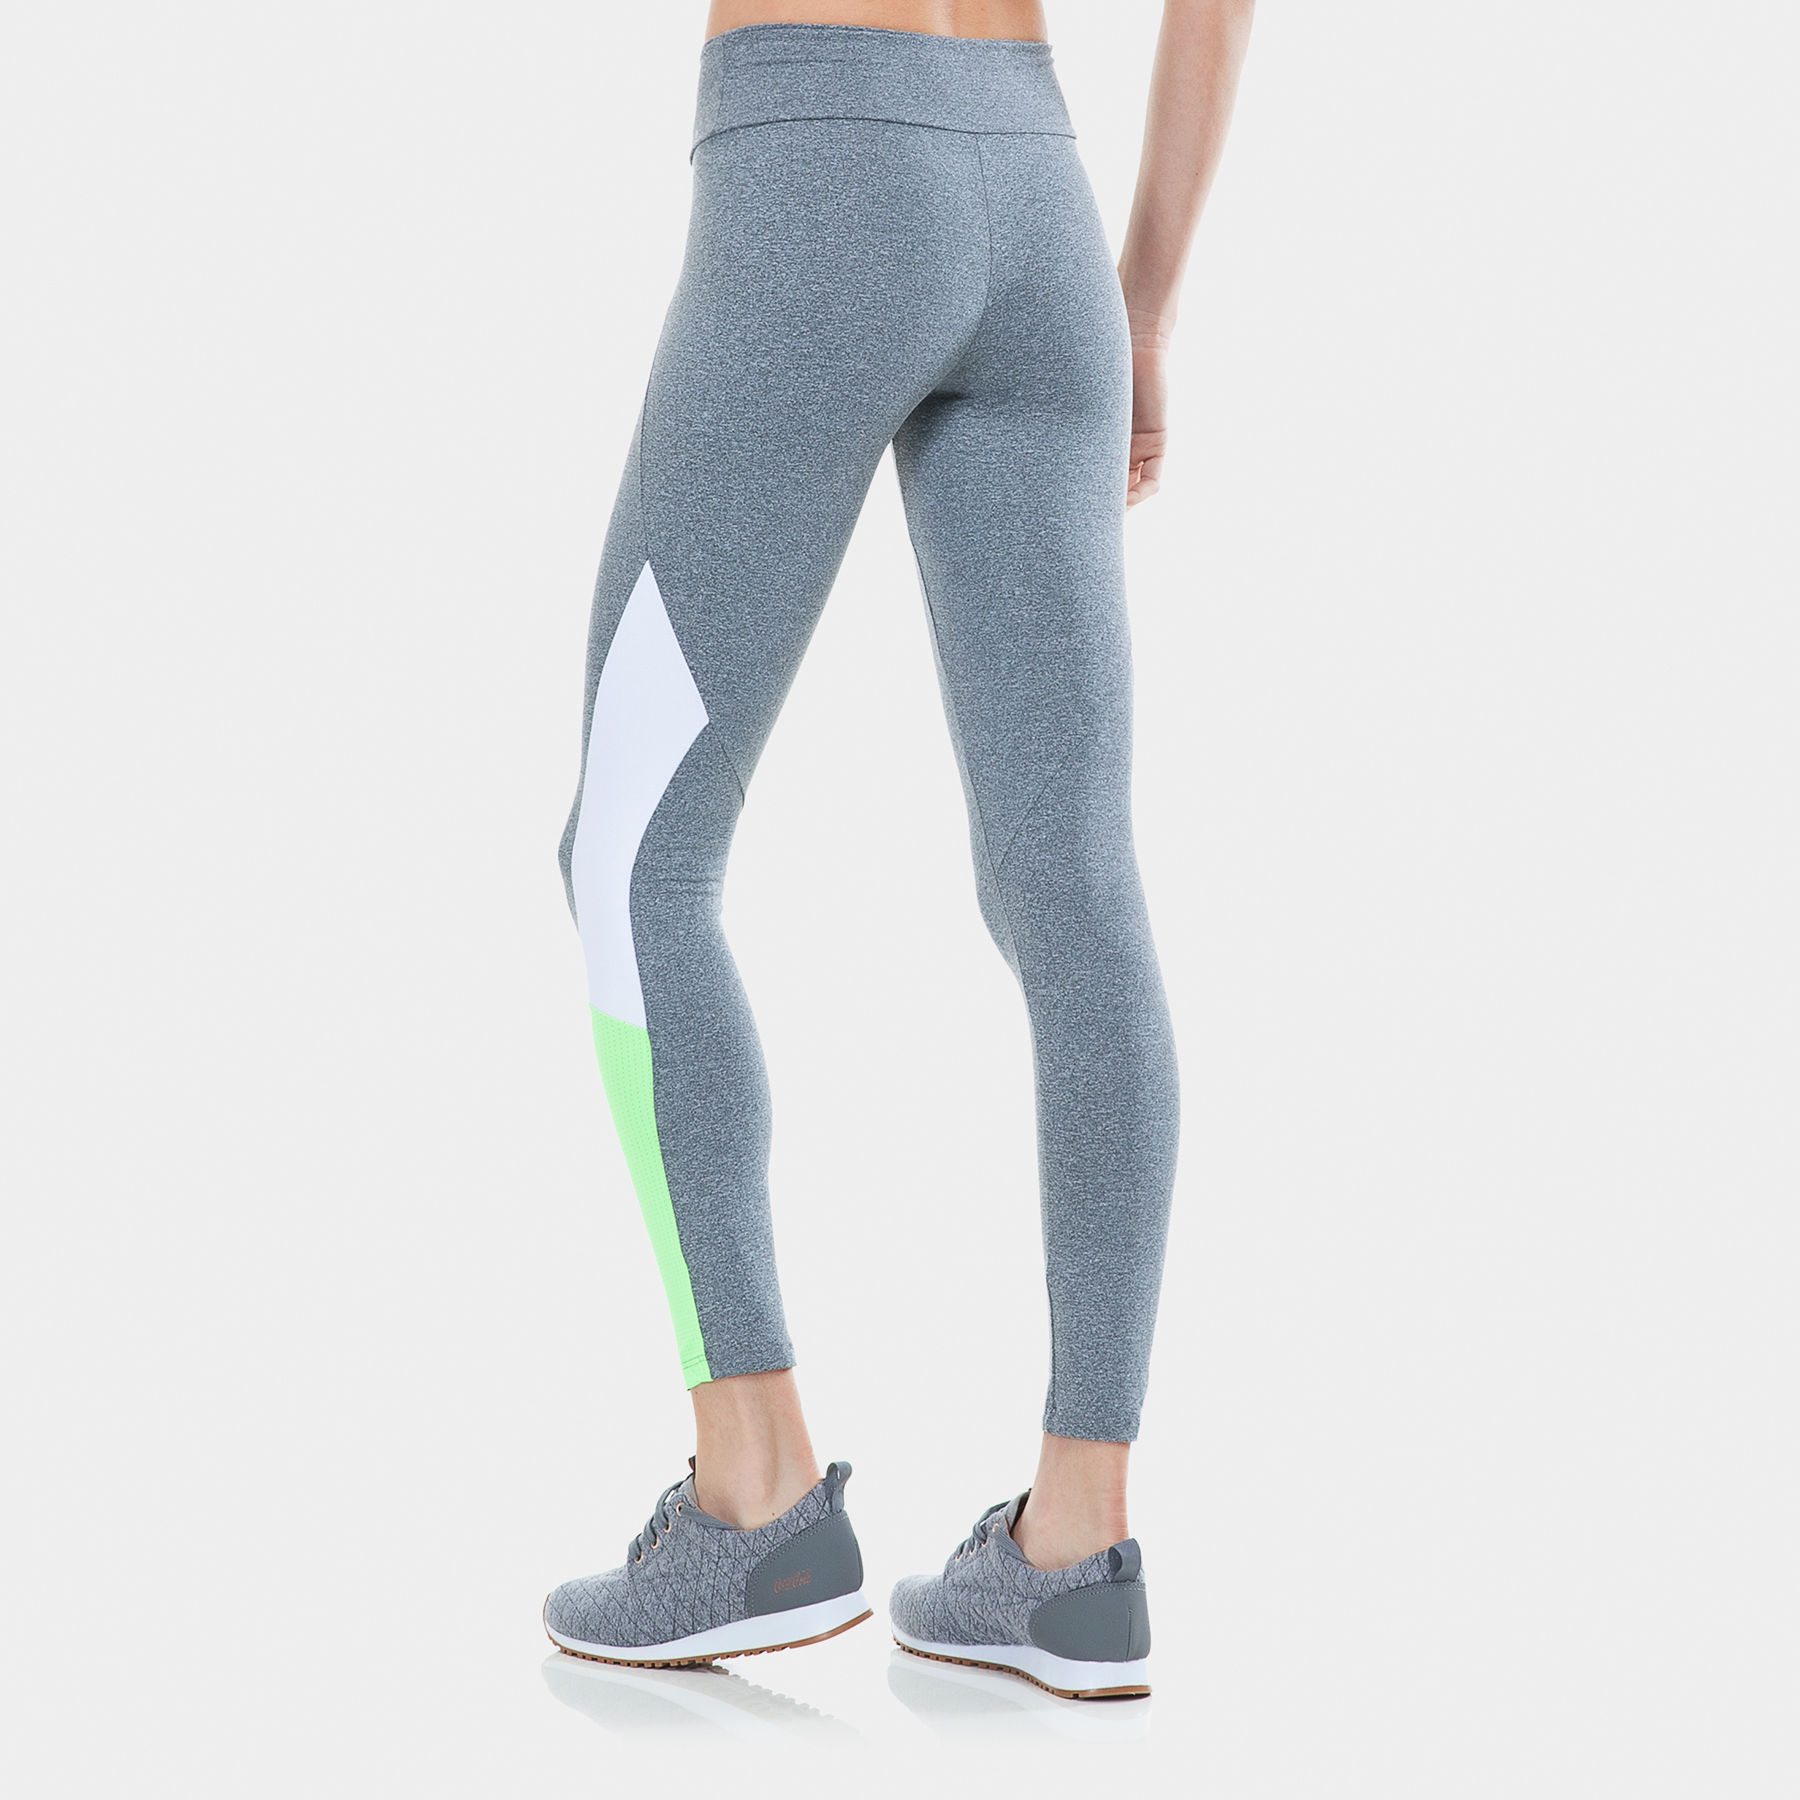 34cff3c8d Calça Legging Fitness Recortes Mescla branco verde - Graphene